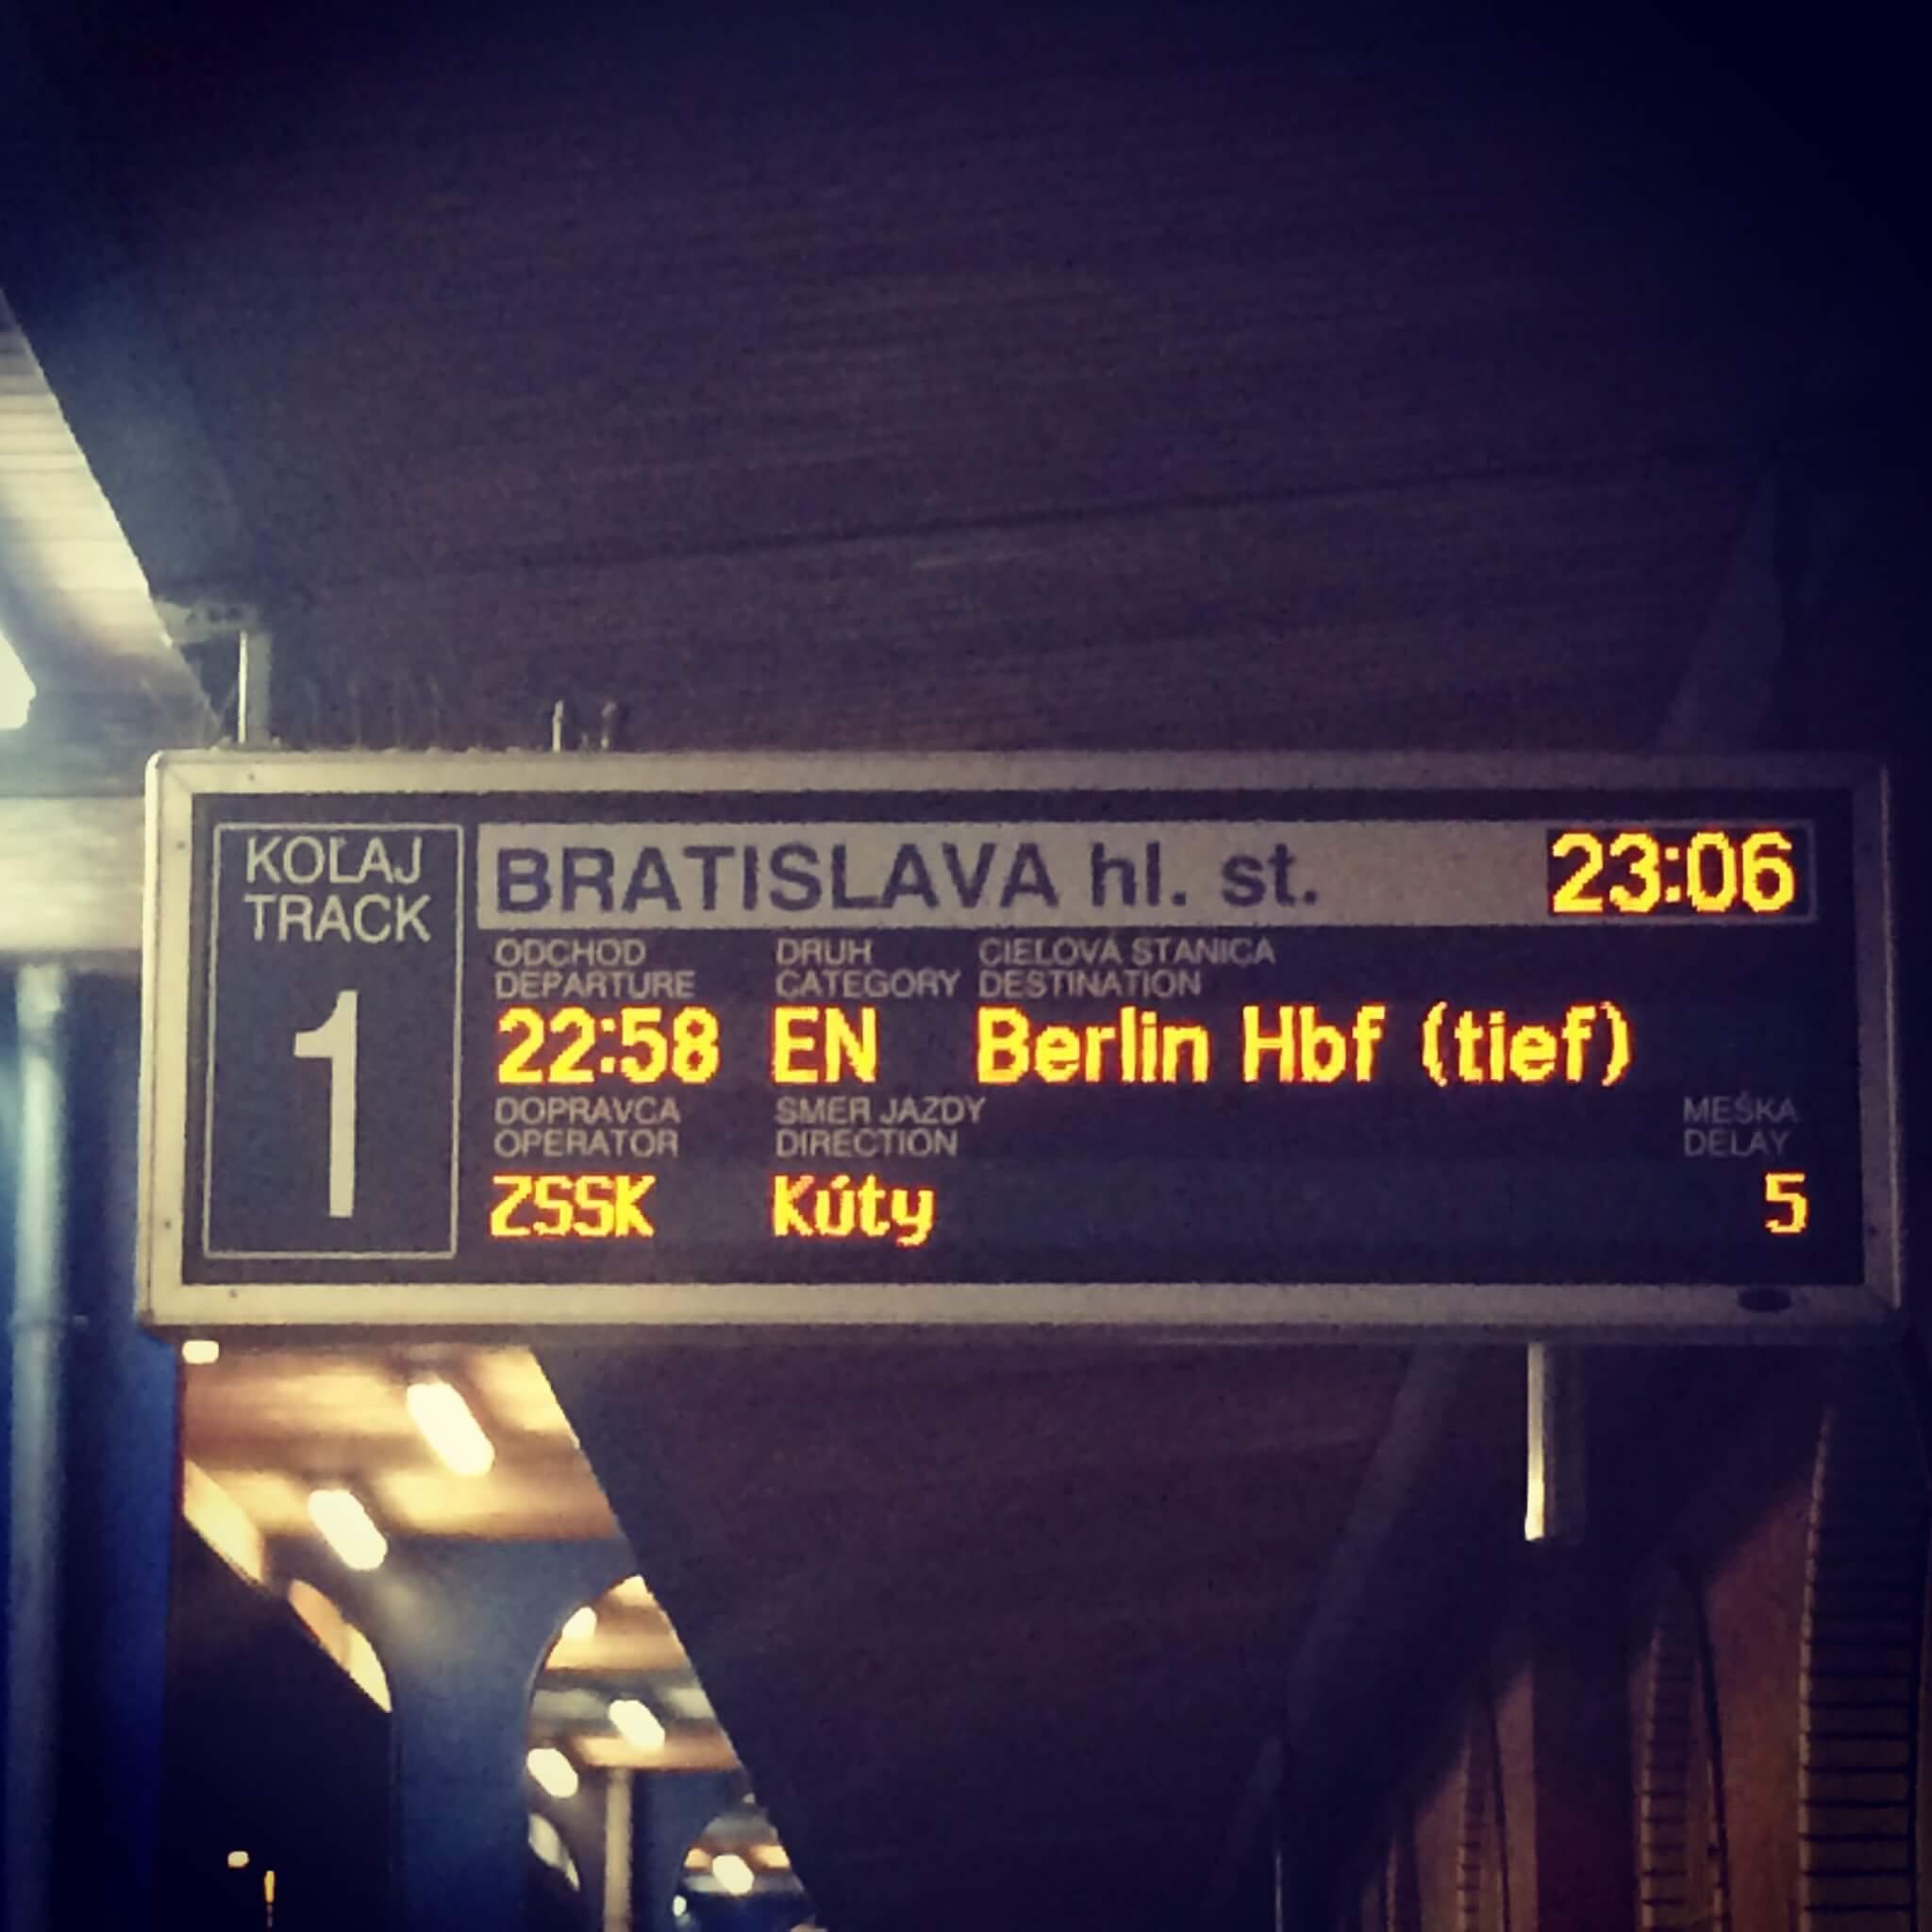 Bratislava - Berlin